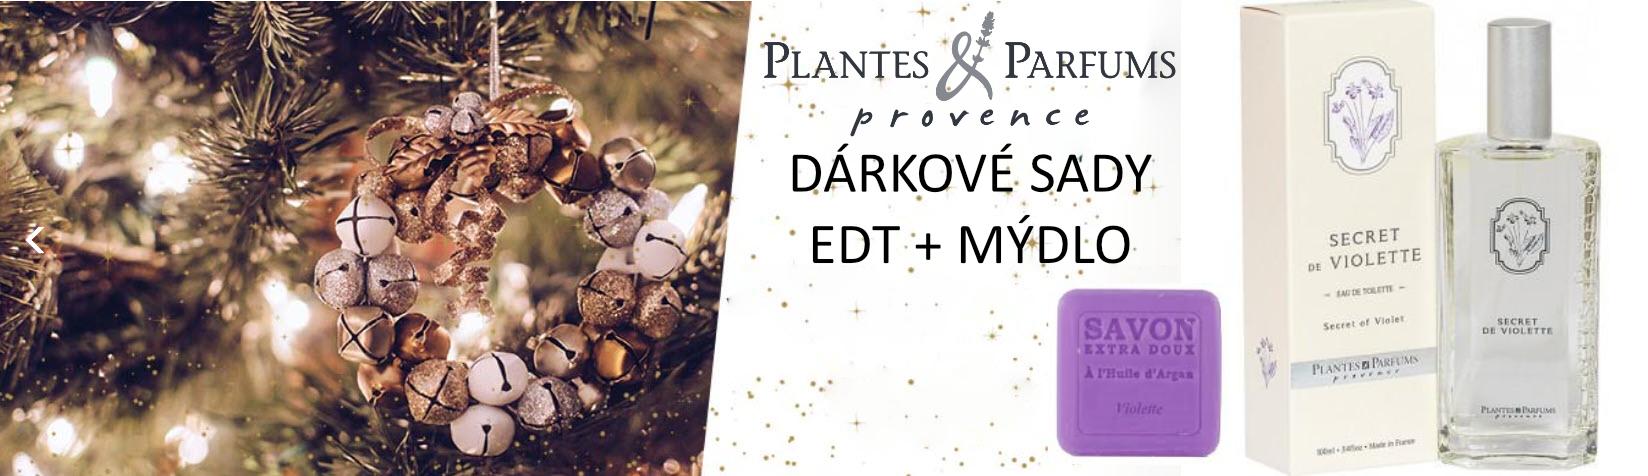 PLANTES ET PARFUMS Sada EDT 100ml + mýdlo s arganem 100g